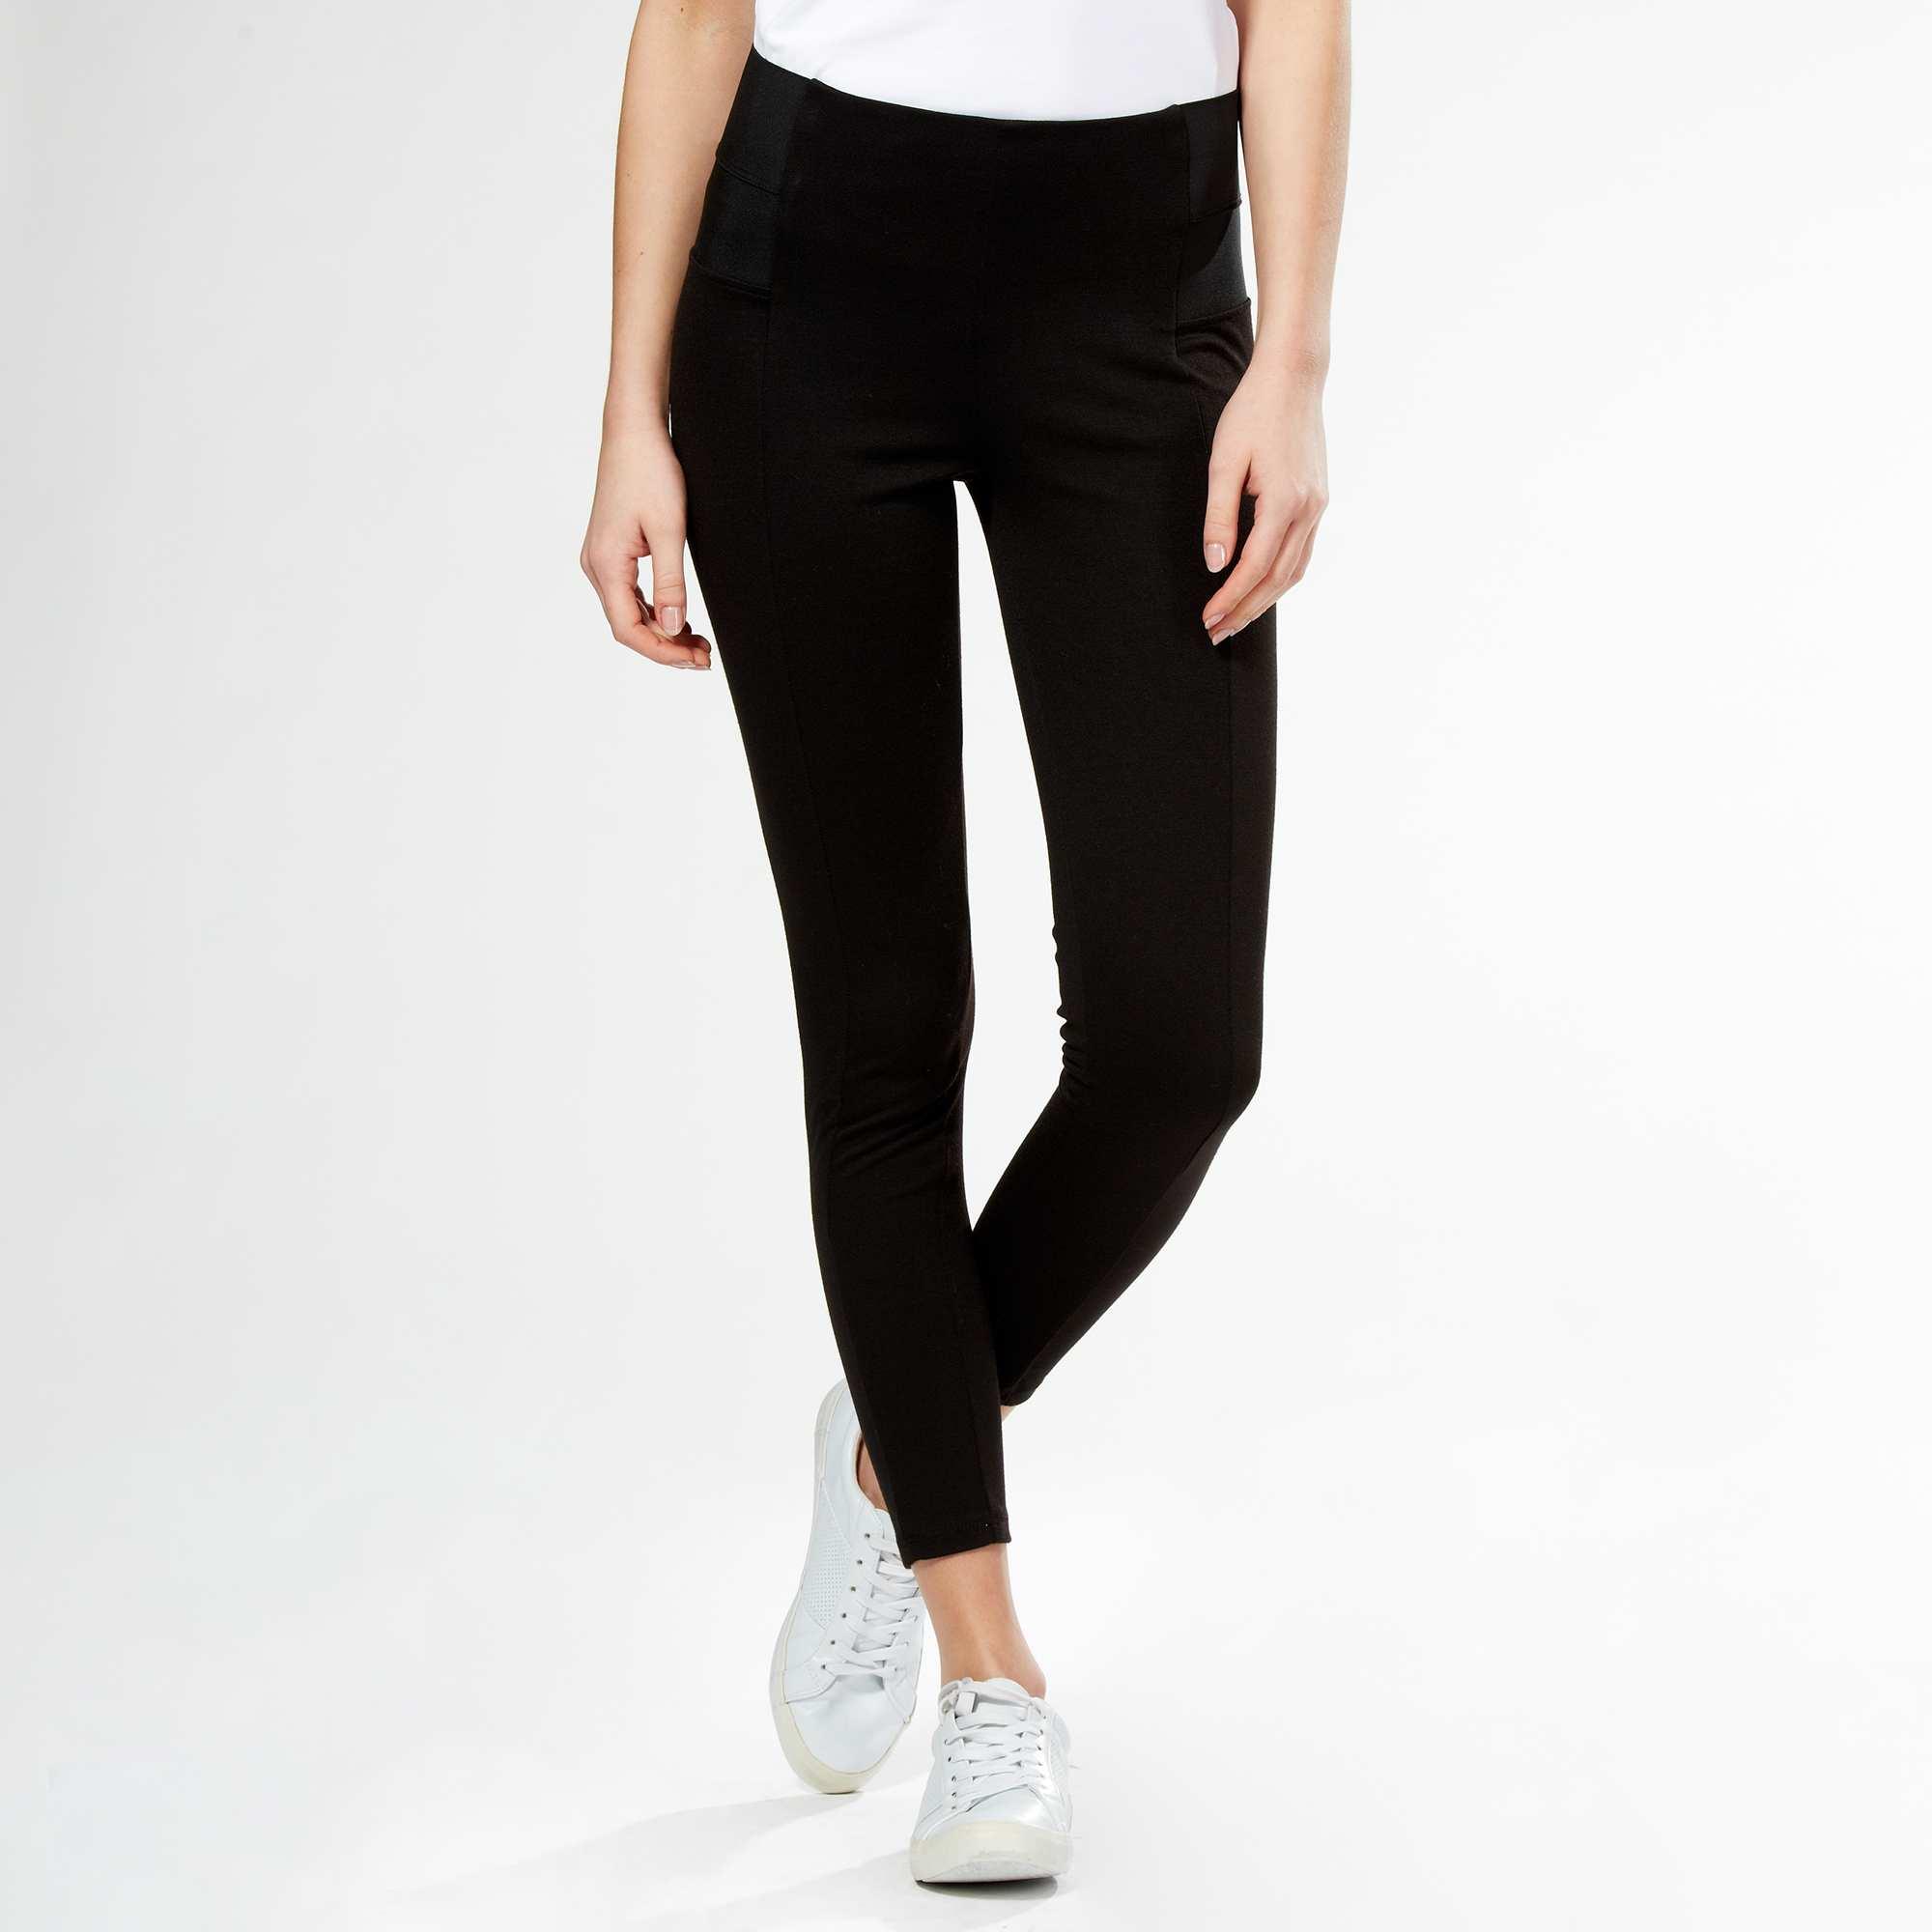 legging stretch taille haute femme kiabi 12 00. Black Bedroom Furniture Sets. Home Design Ideas